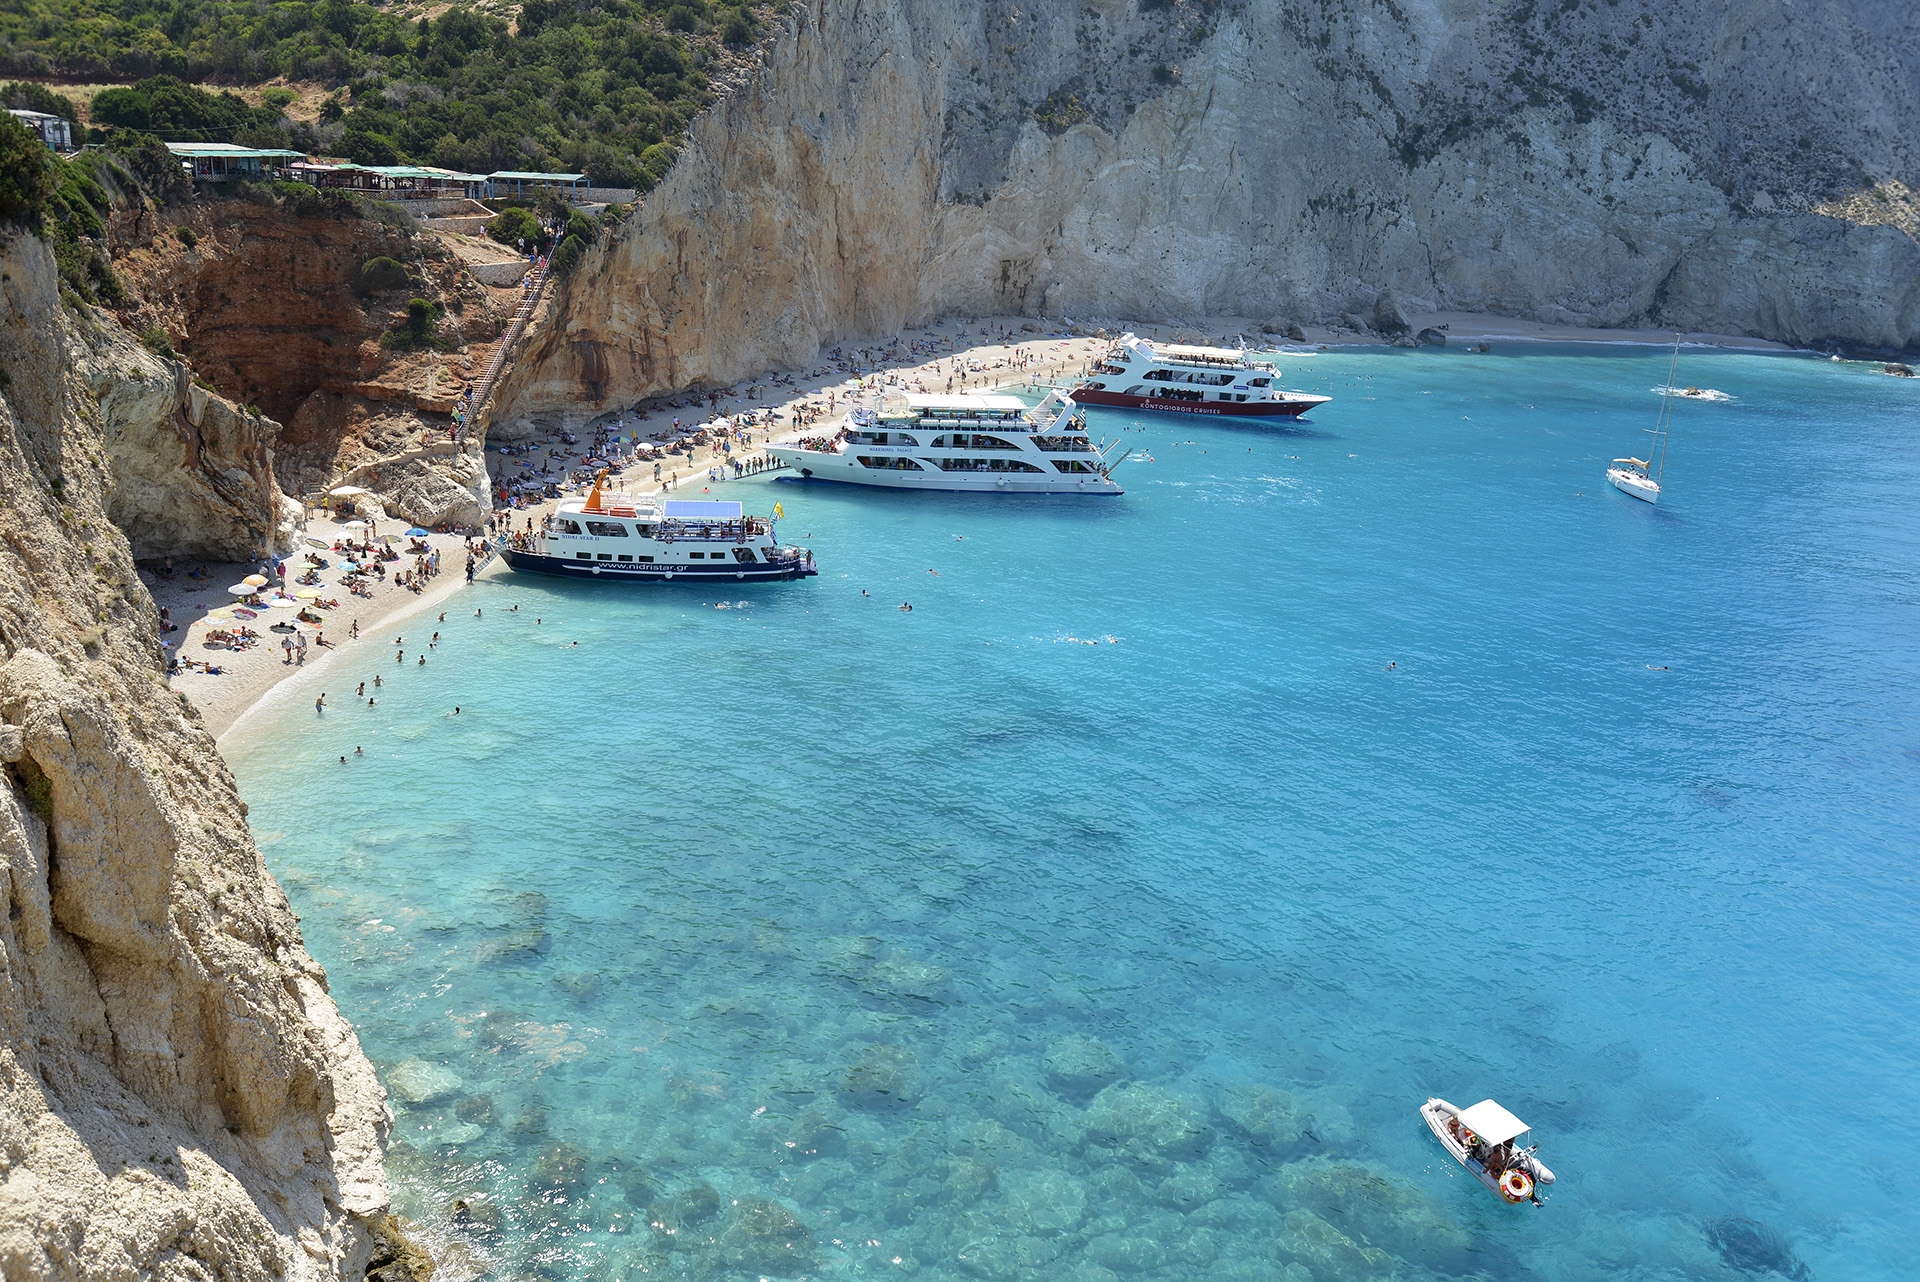 Porto-Katsiki-Beach-Lefkada-Island-Greece-01